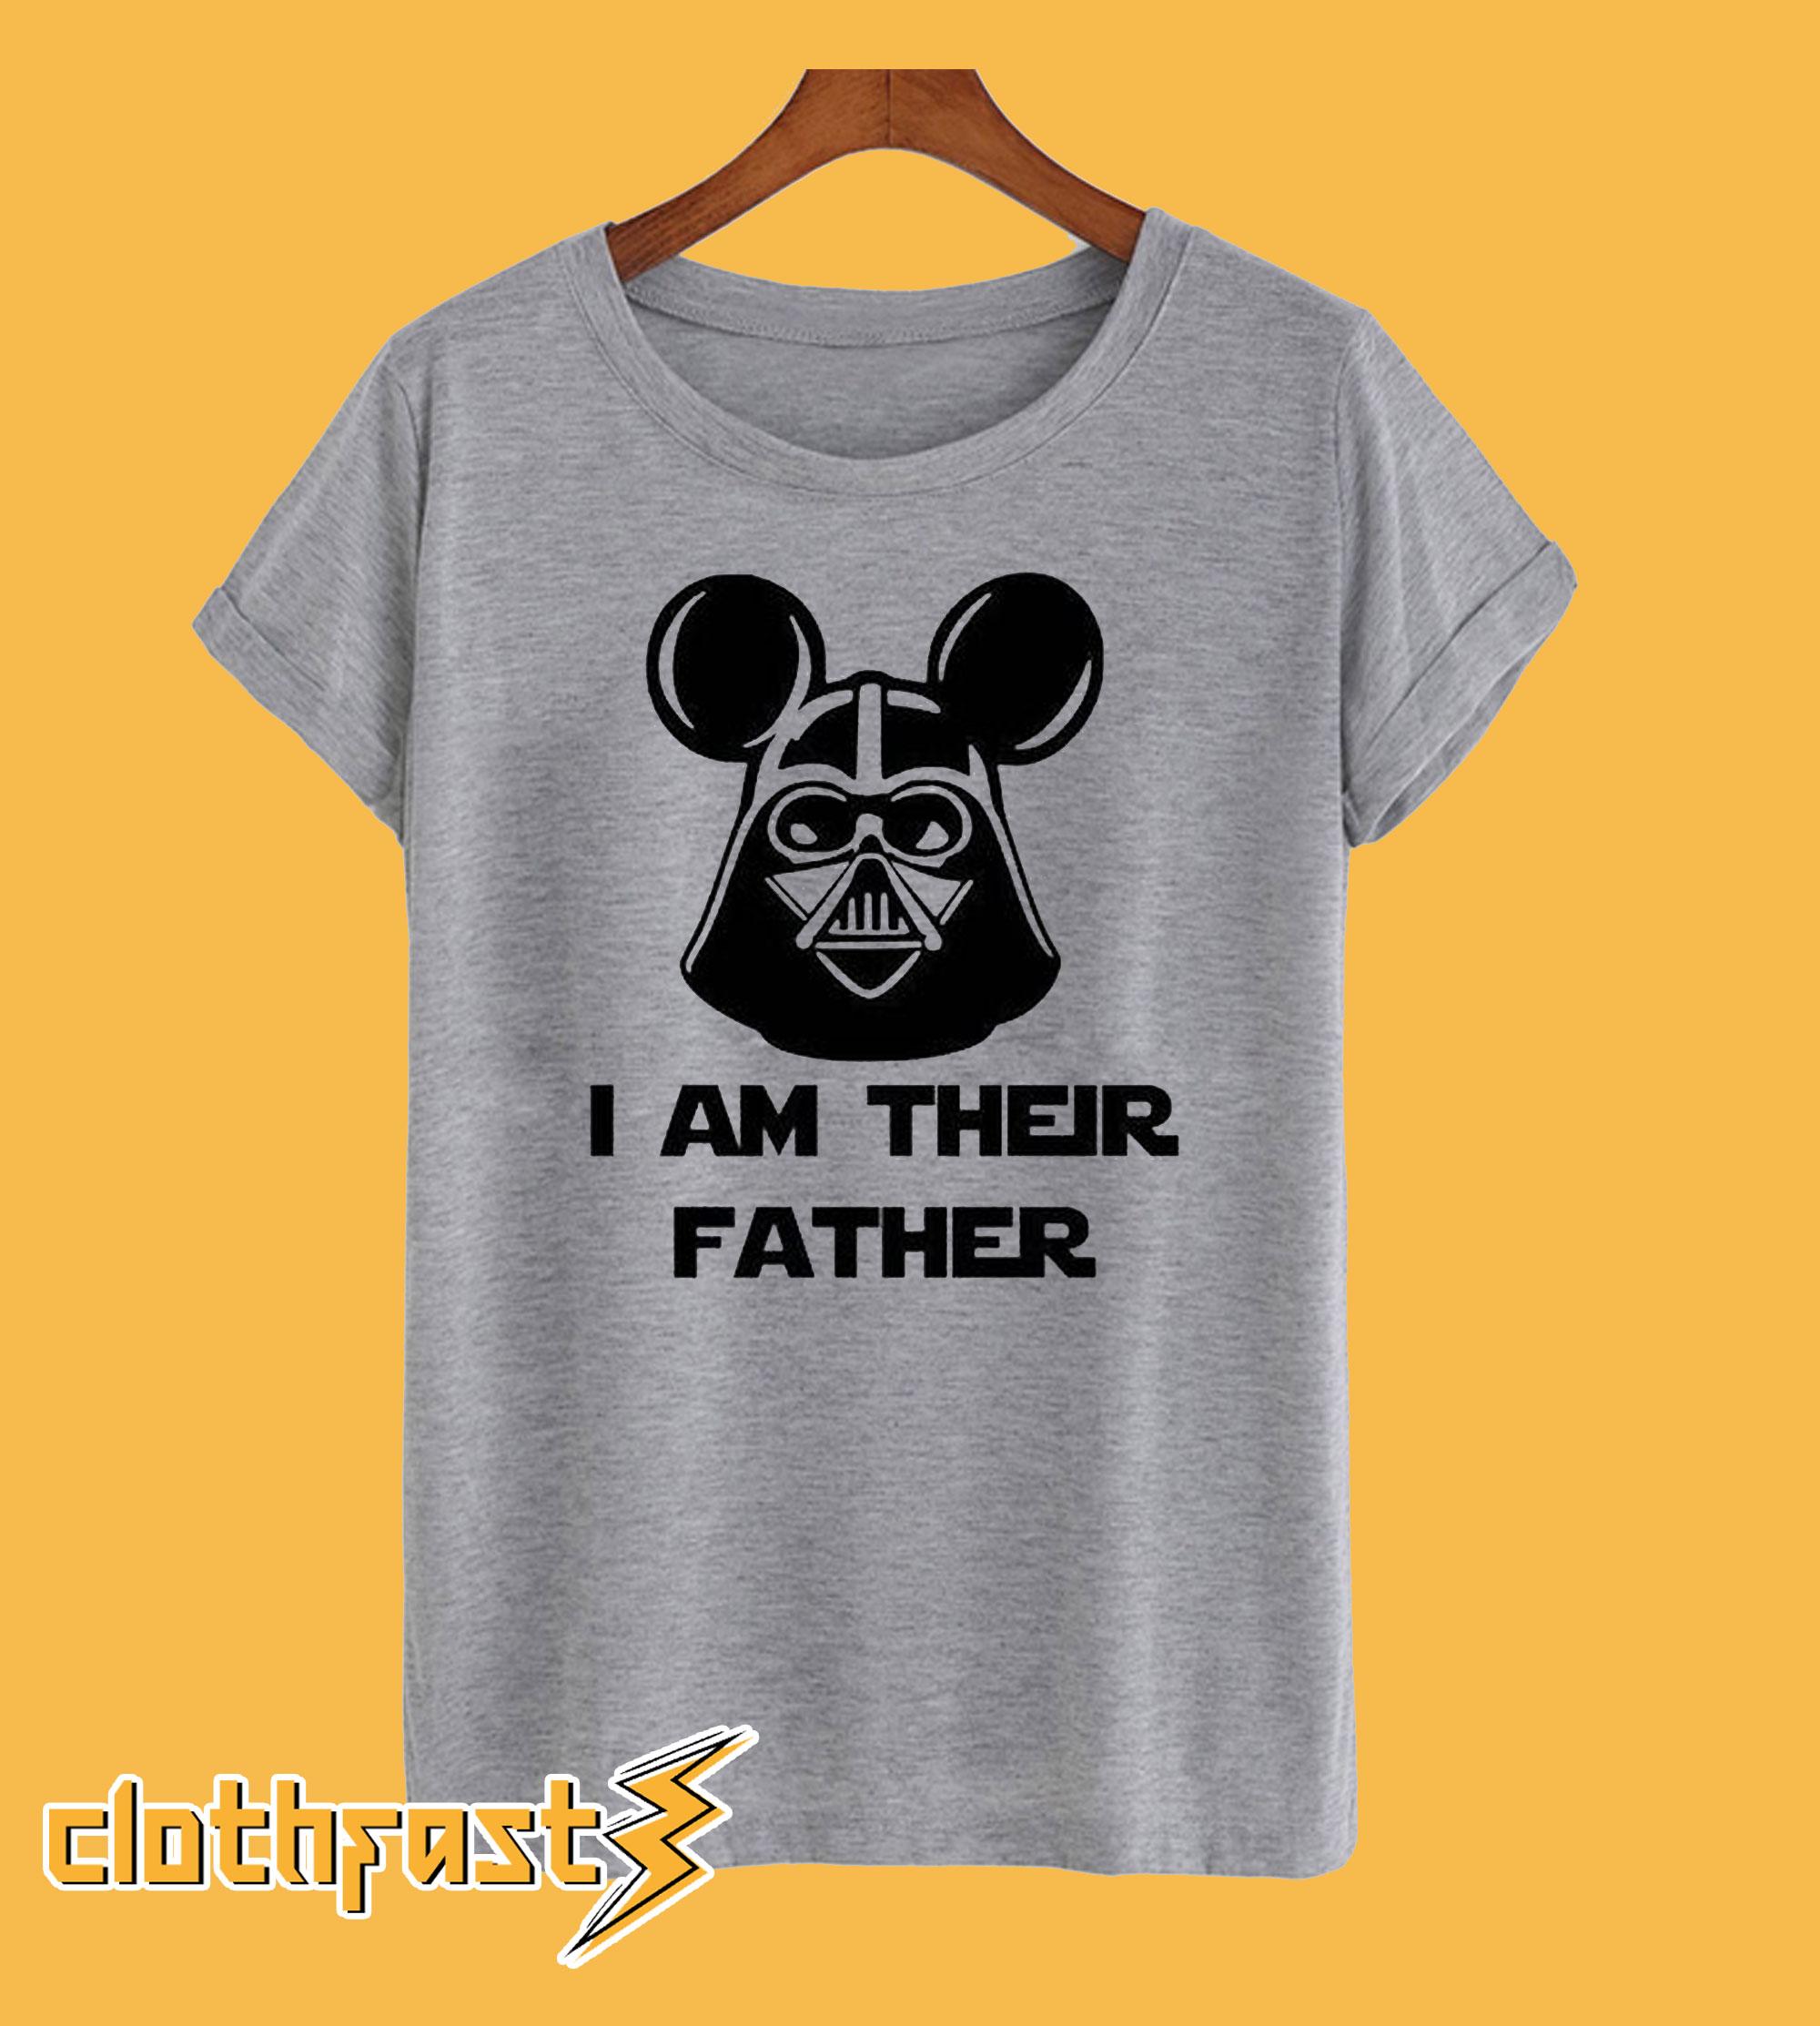 I'm Their Father Disney Darth Vader T-Shirt